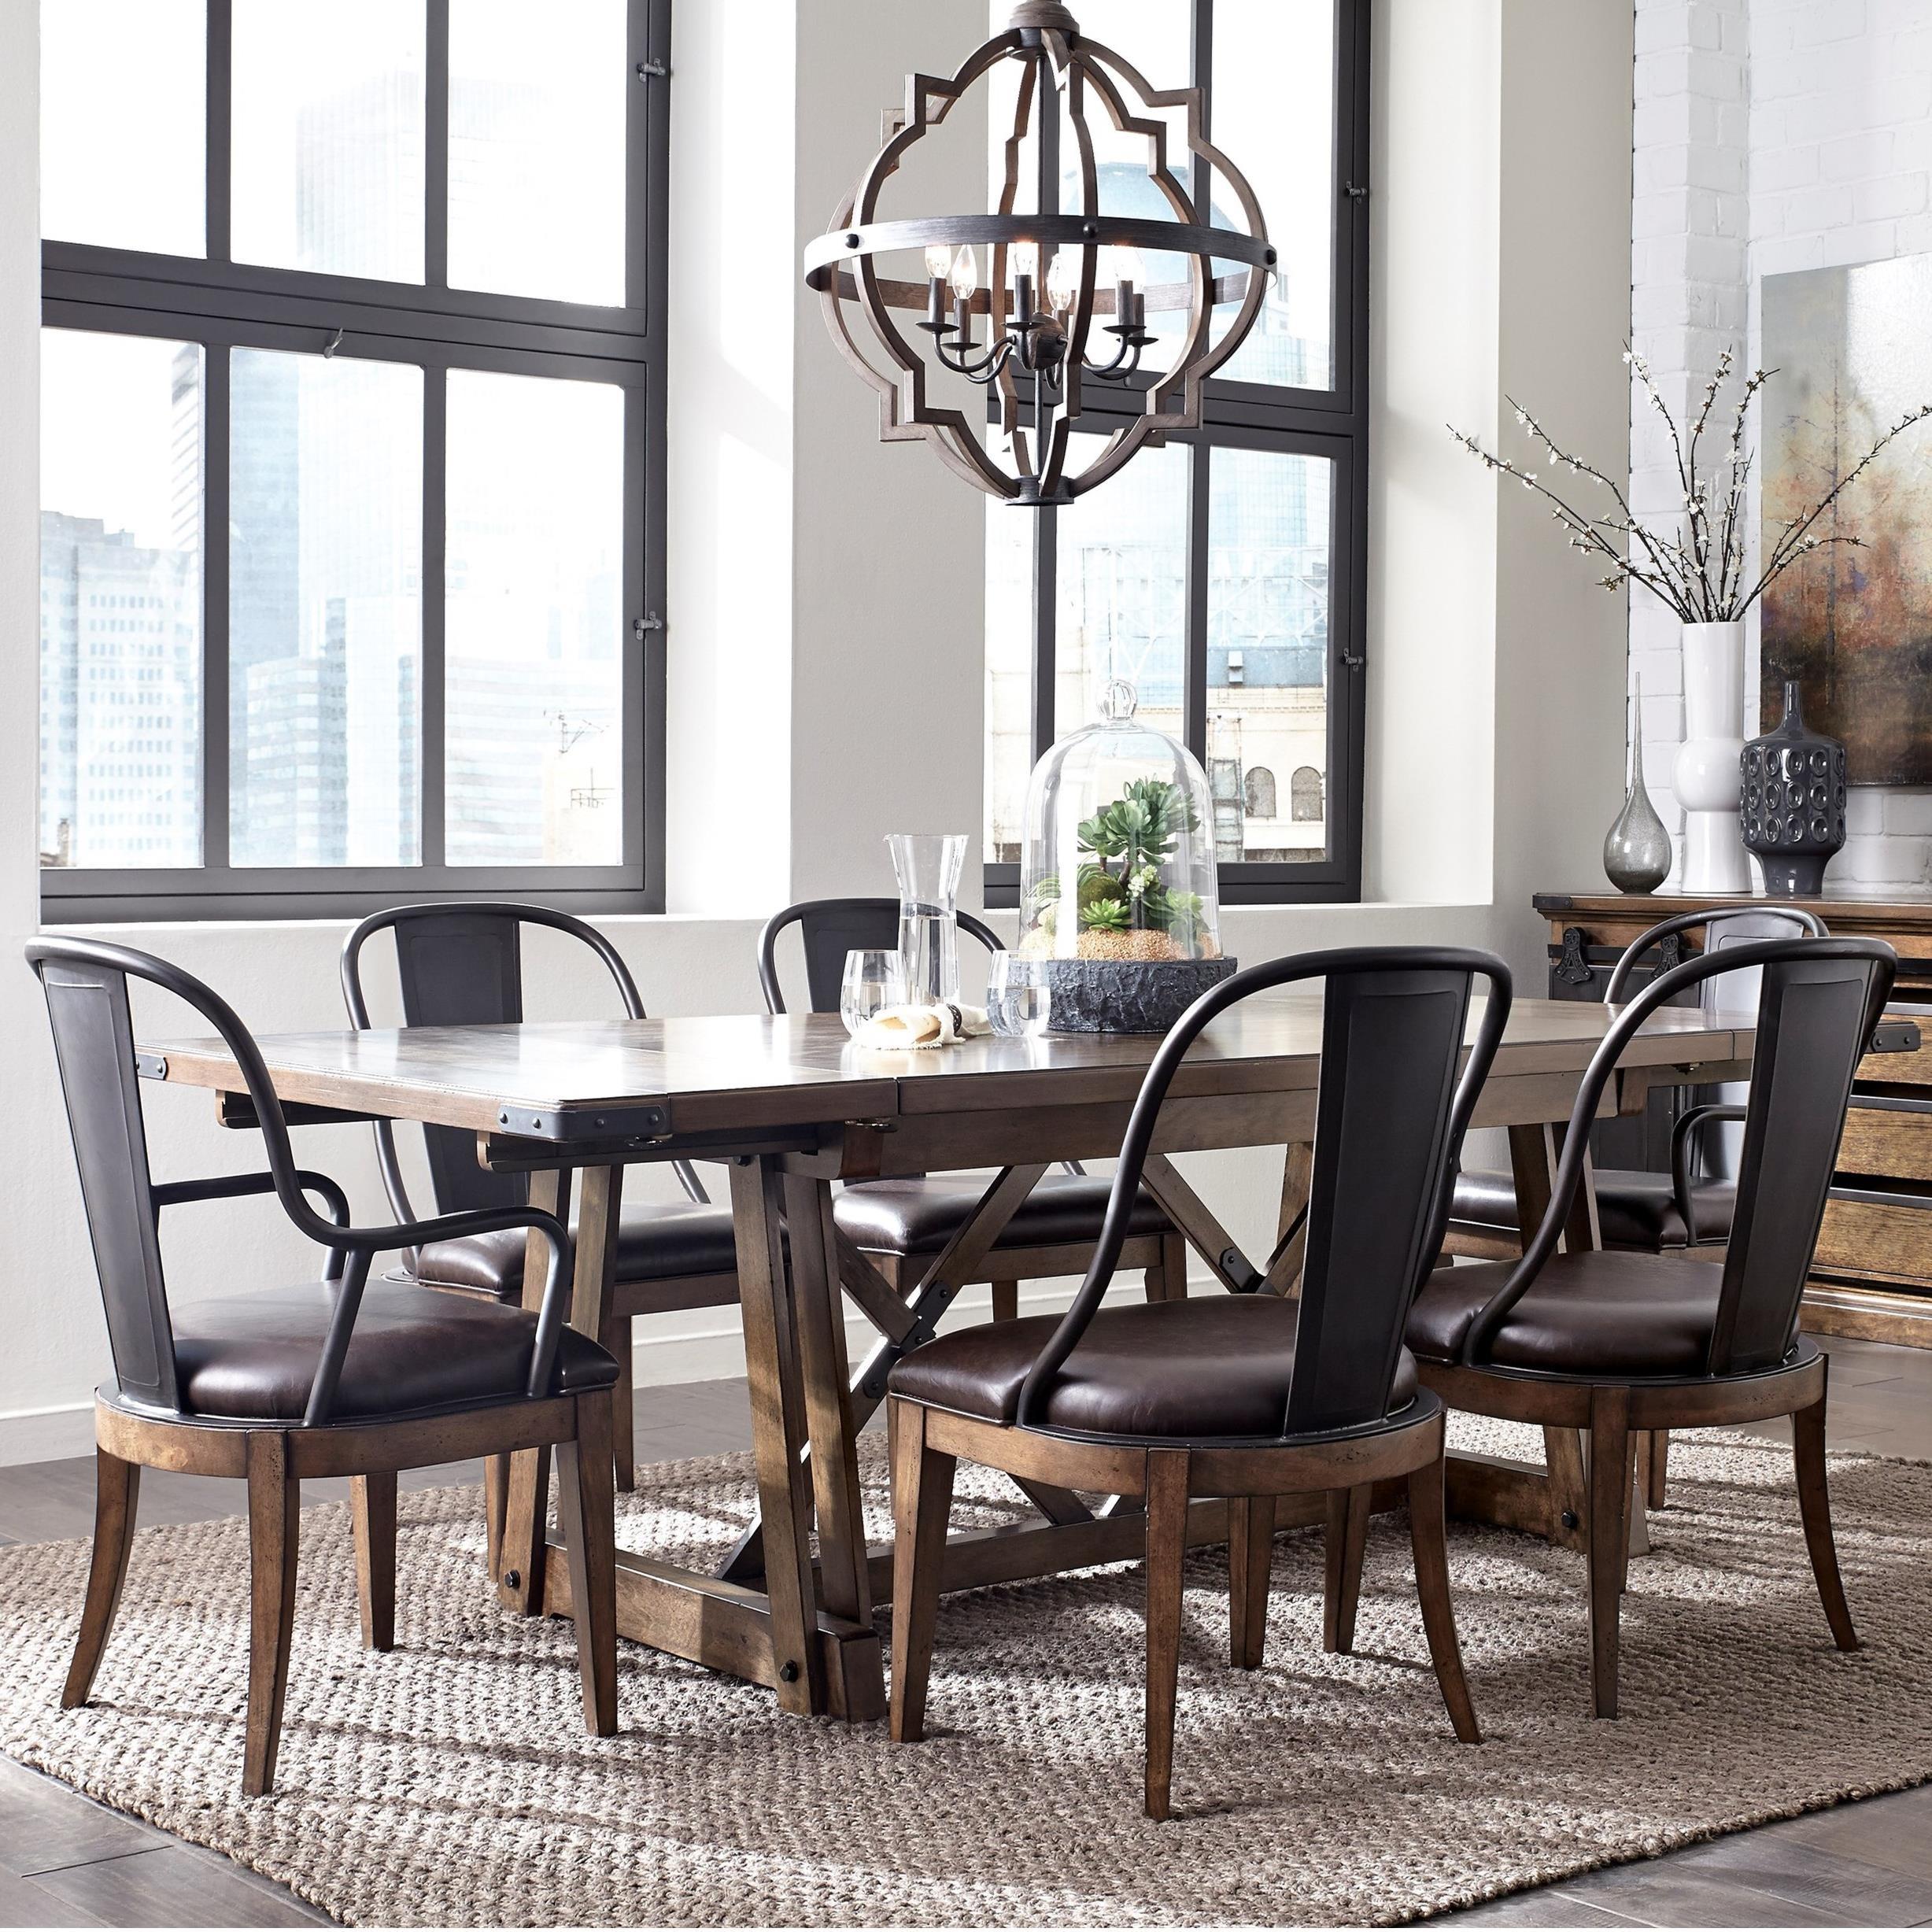 Pulaski Furniture Weston Loft 7 Piece Trestle Table And Metal Chair Set